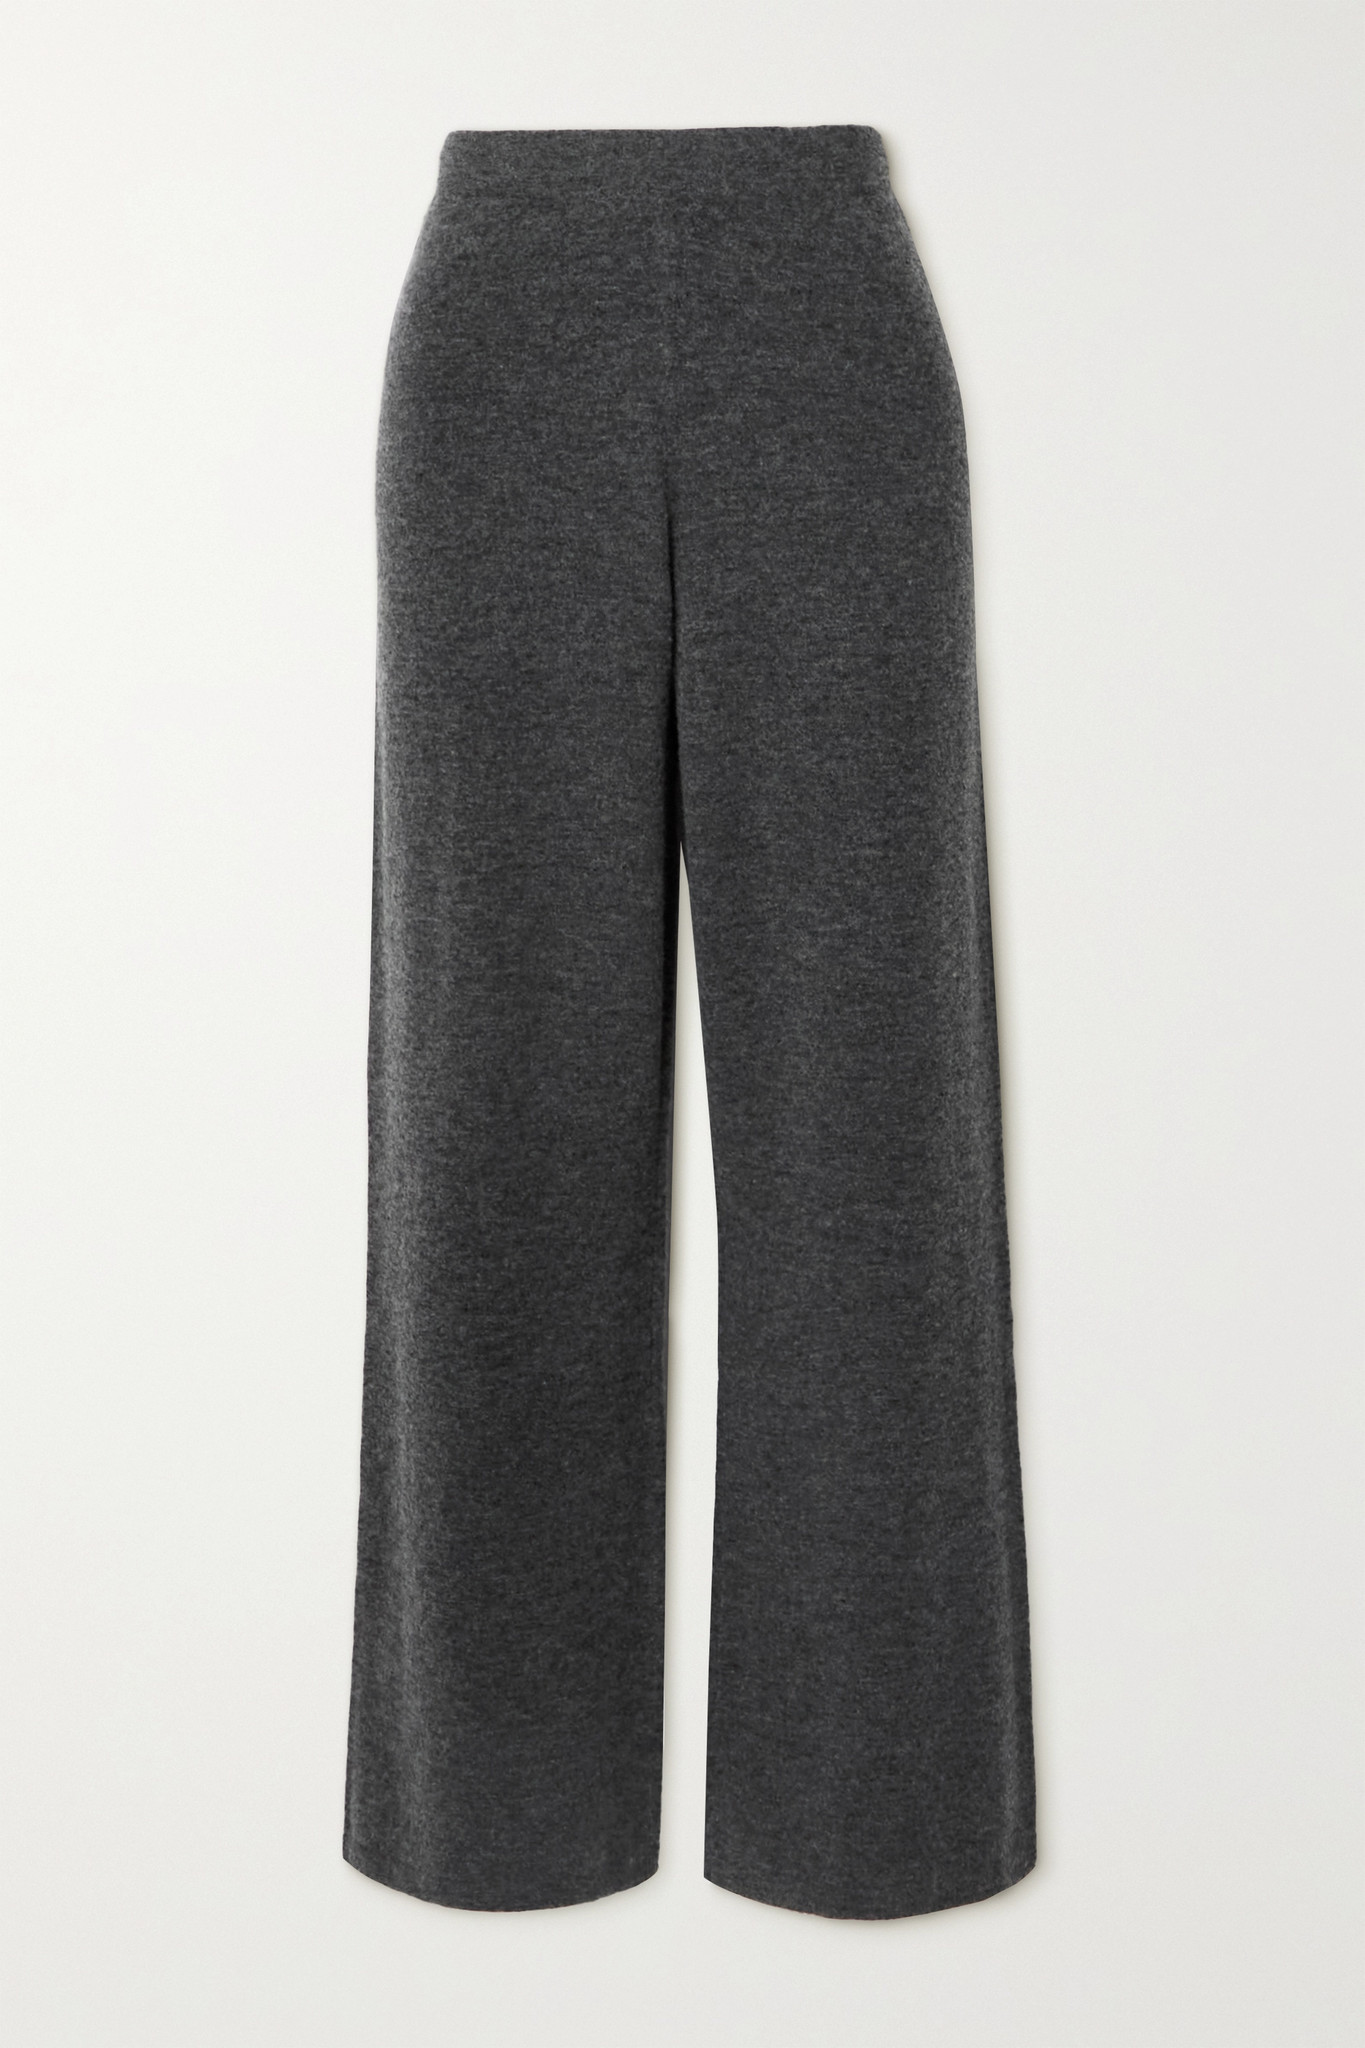 JOSEPH - Knitted Wide-leg Pants - Gray - medium